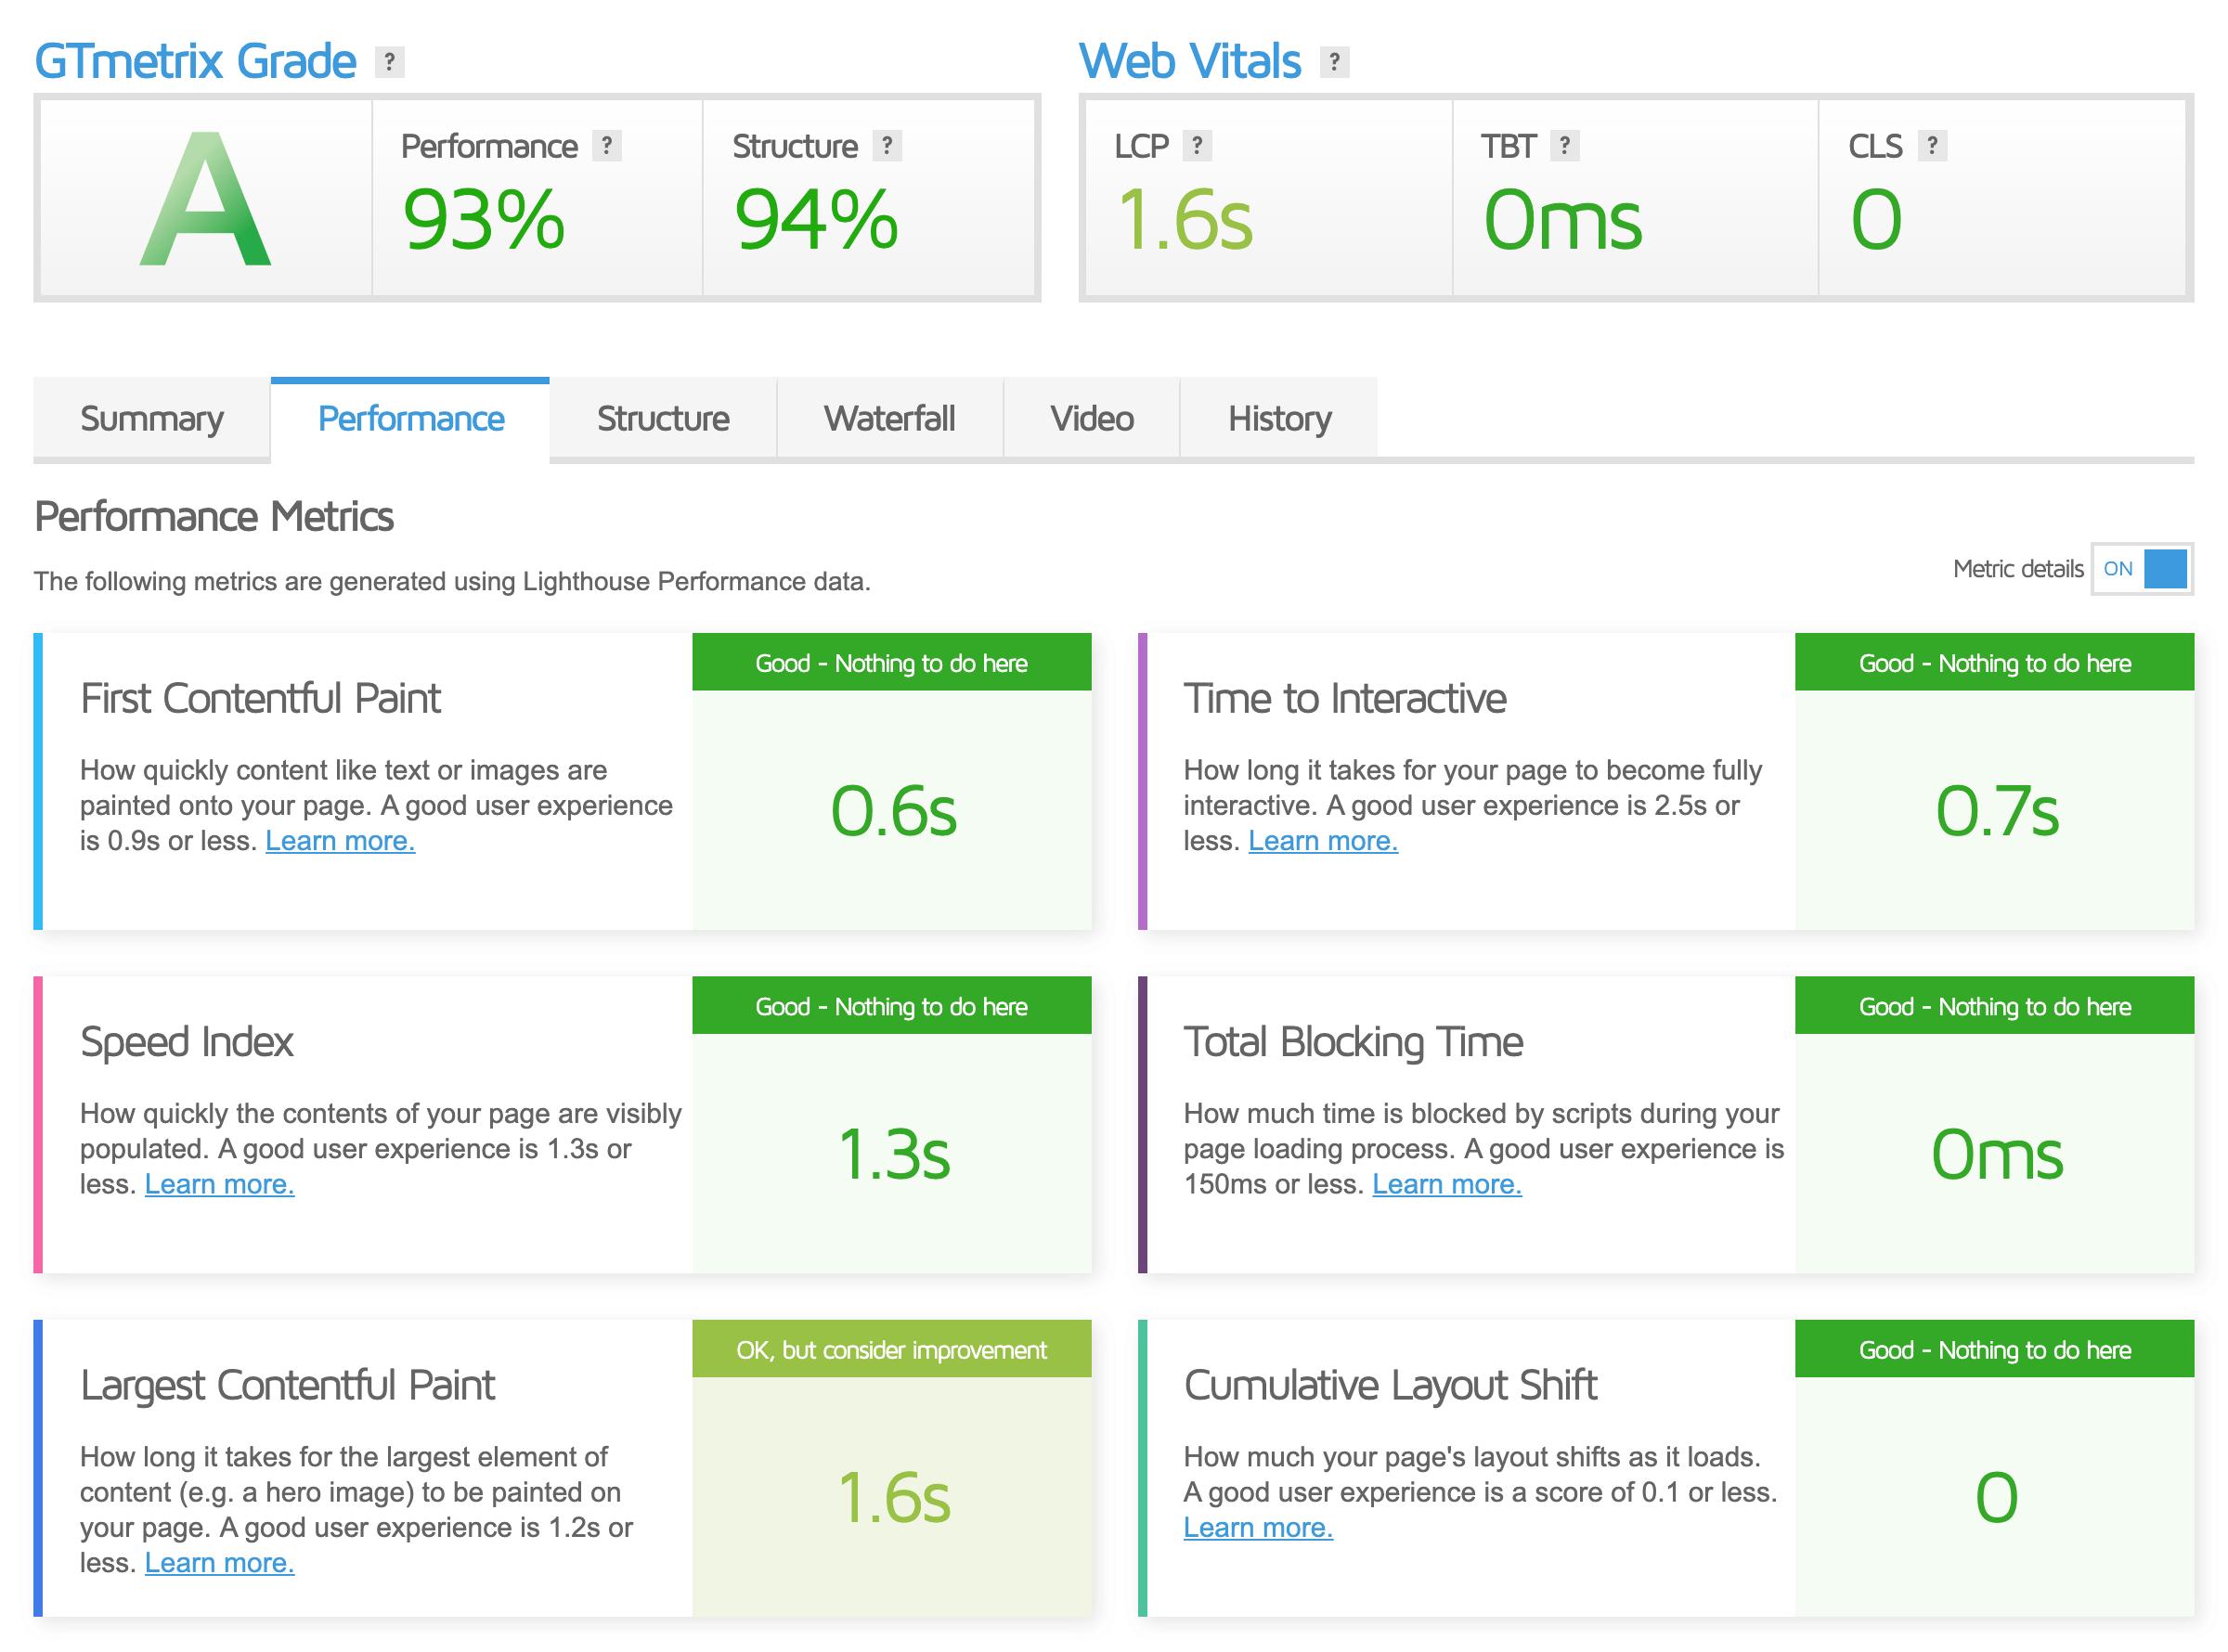 Rocket.net Hosting GTmetrix Score